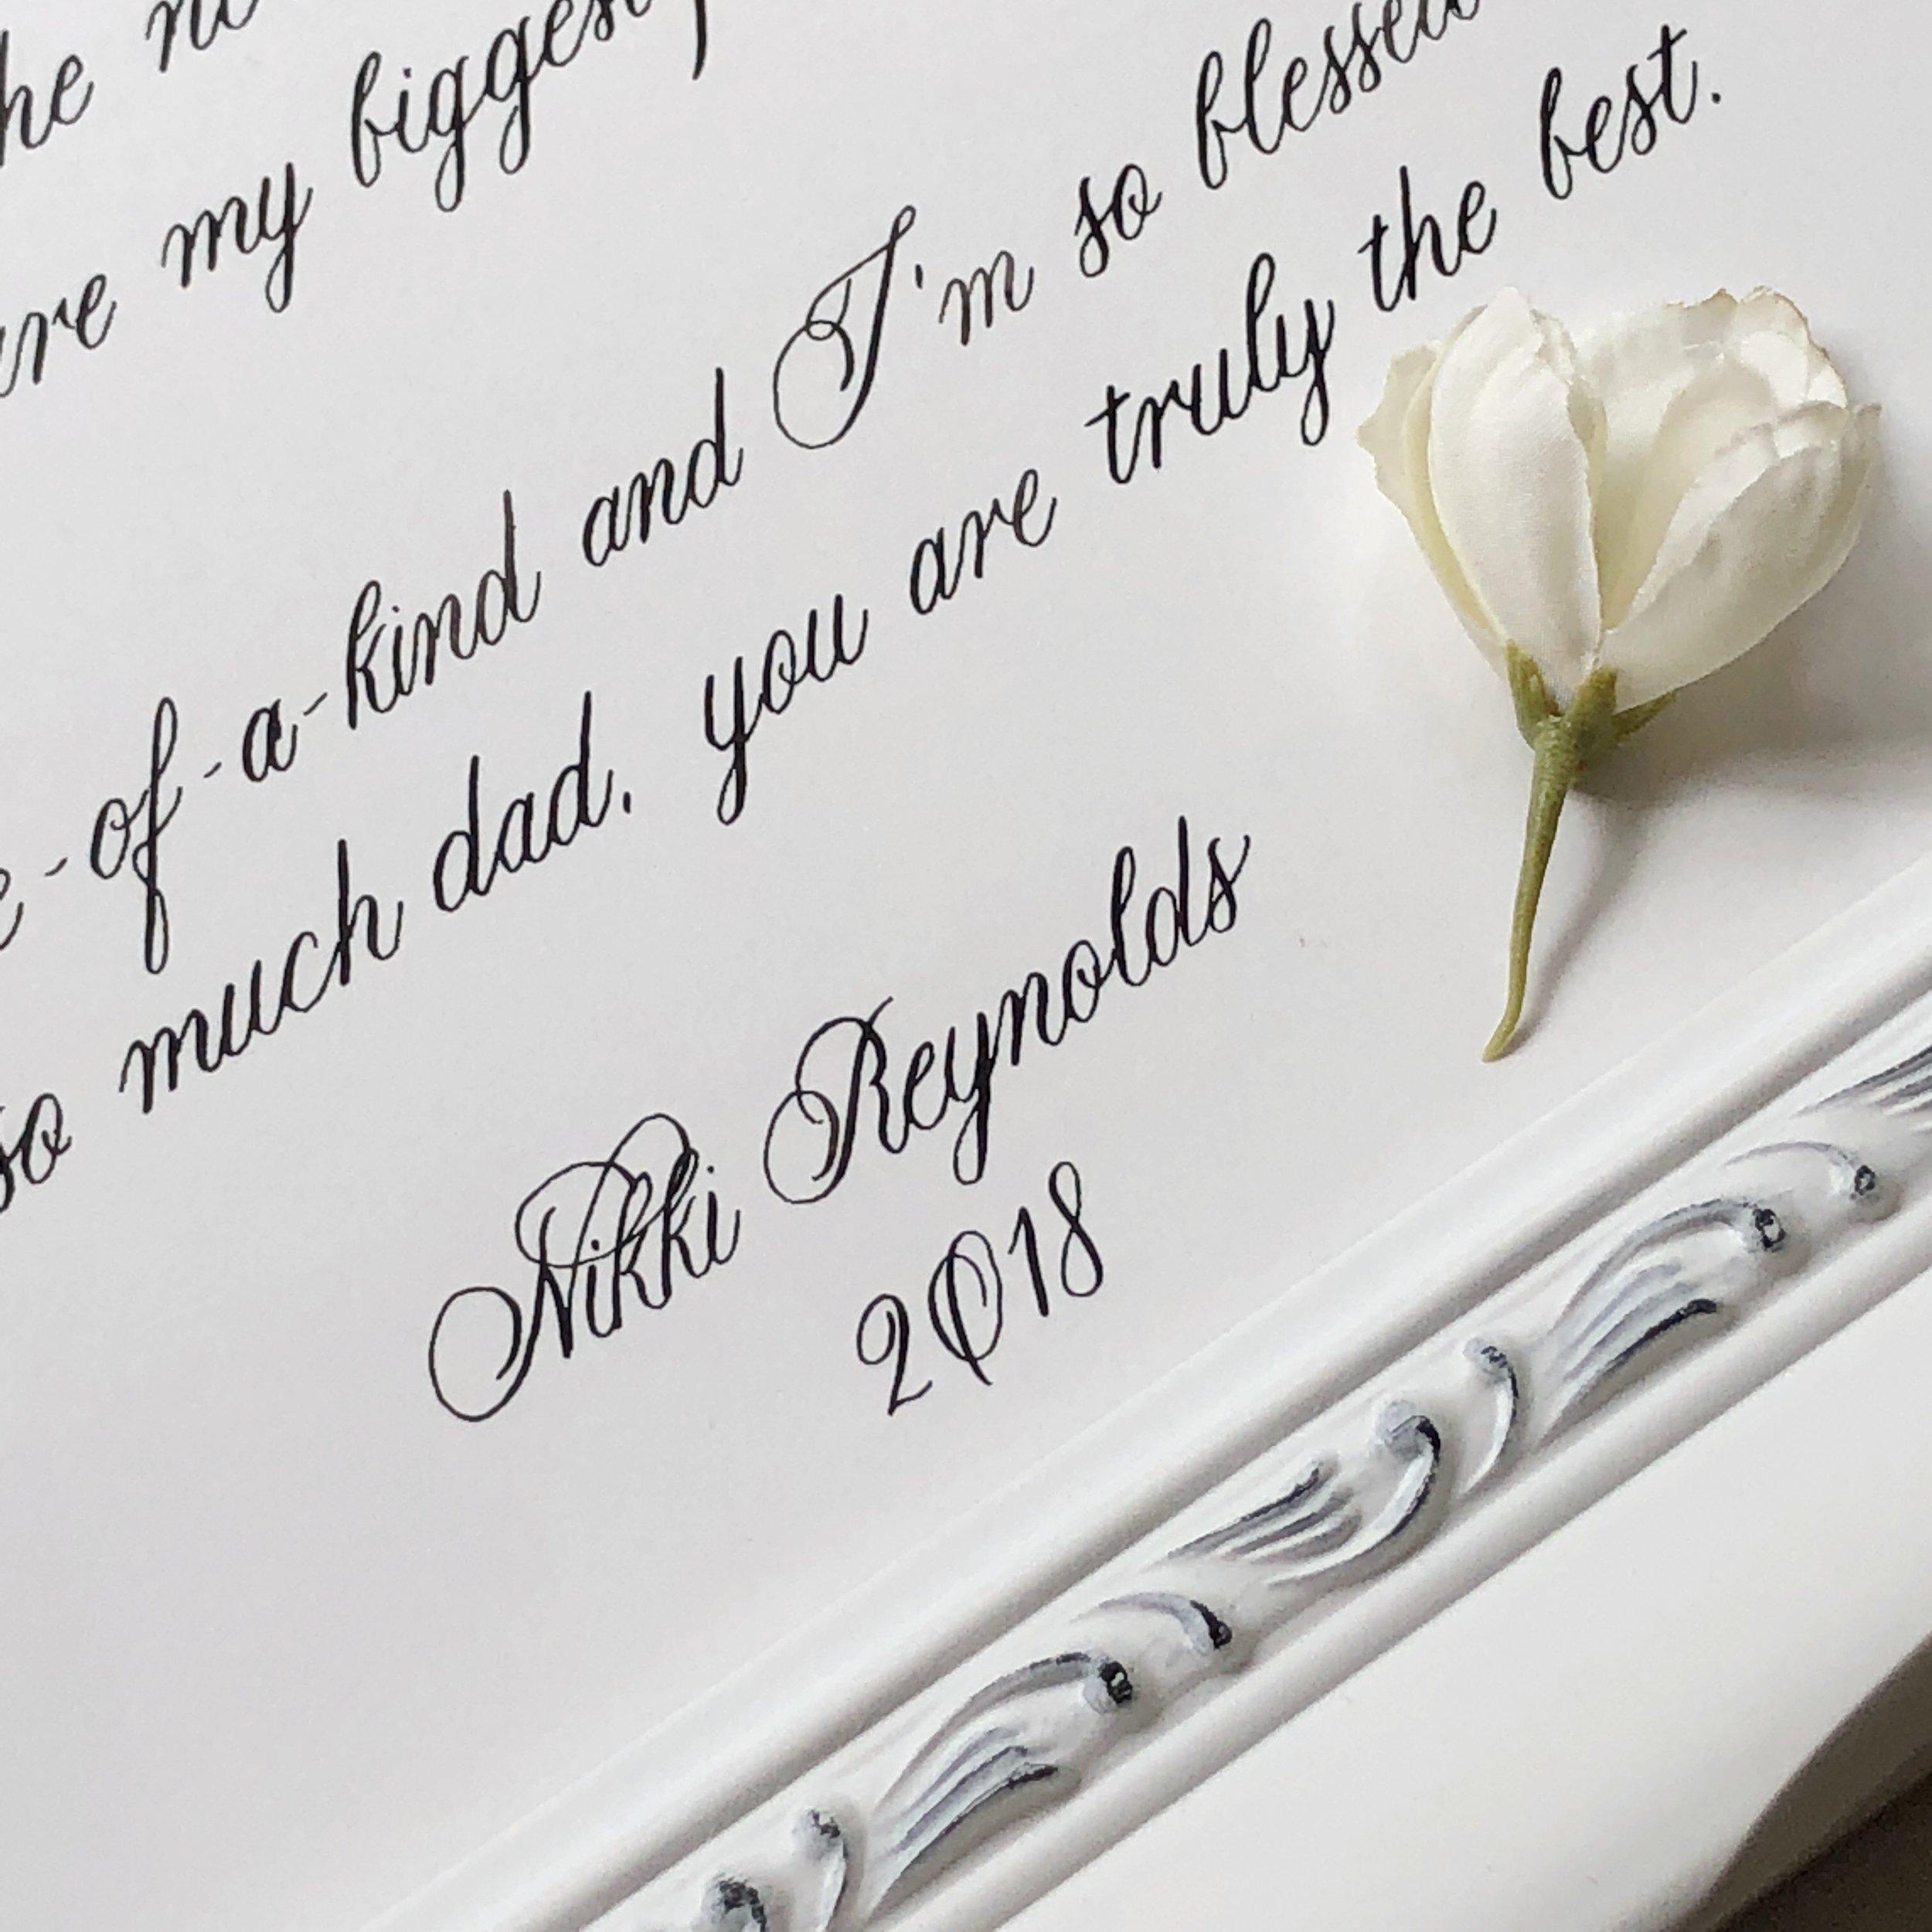 Central PA, York PA, JesSmith Designs, custom, wedding, invitations, bridal, Harrisburg, hanover, calligraphy, baltimore, wedding invitations, lancaster, gettysburg, 09-12 14.59.49.jpg